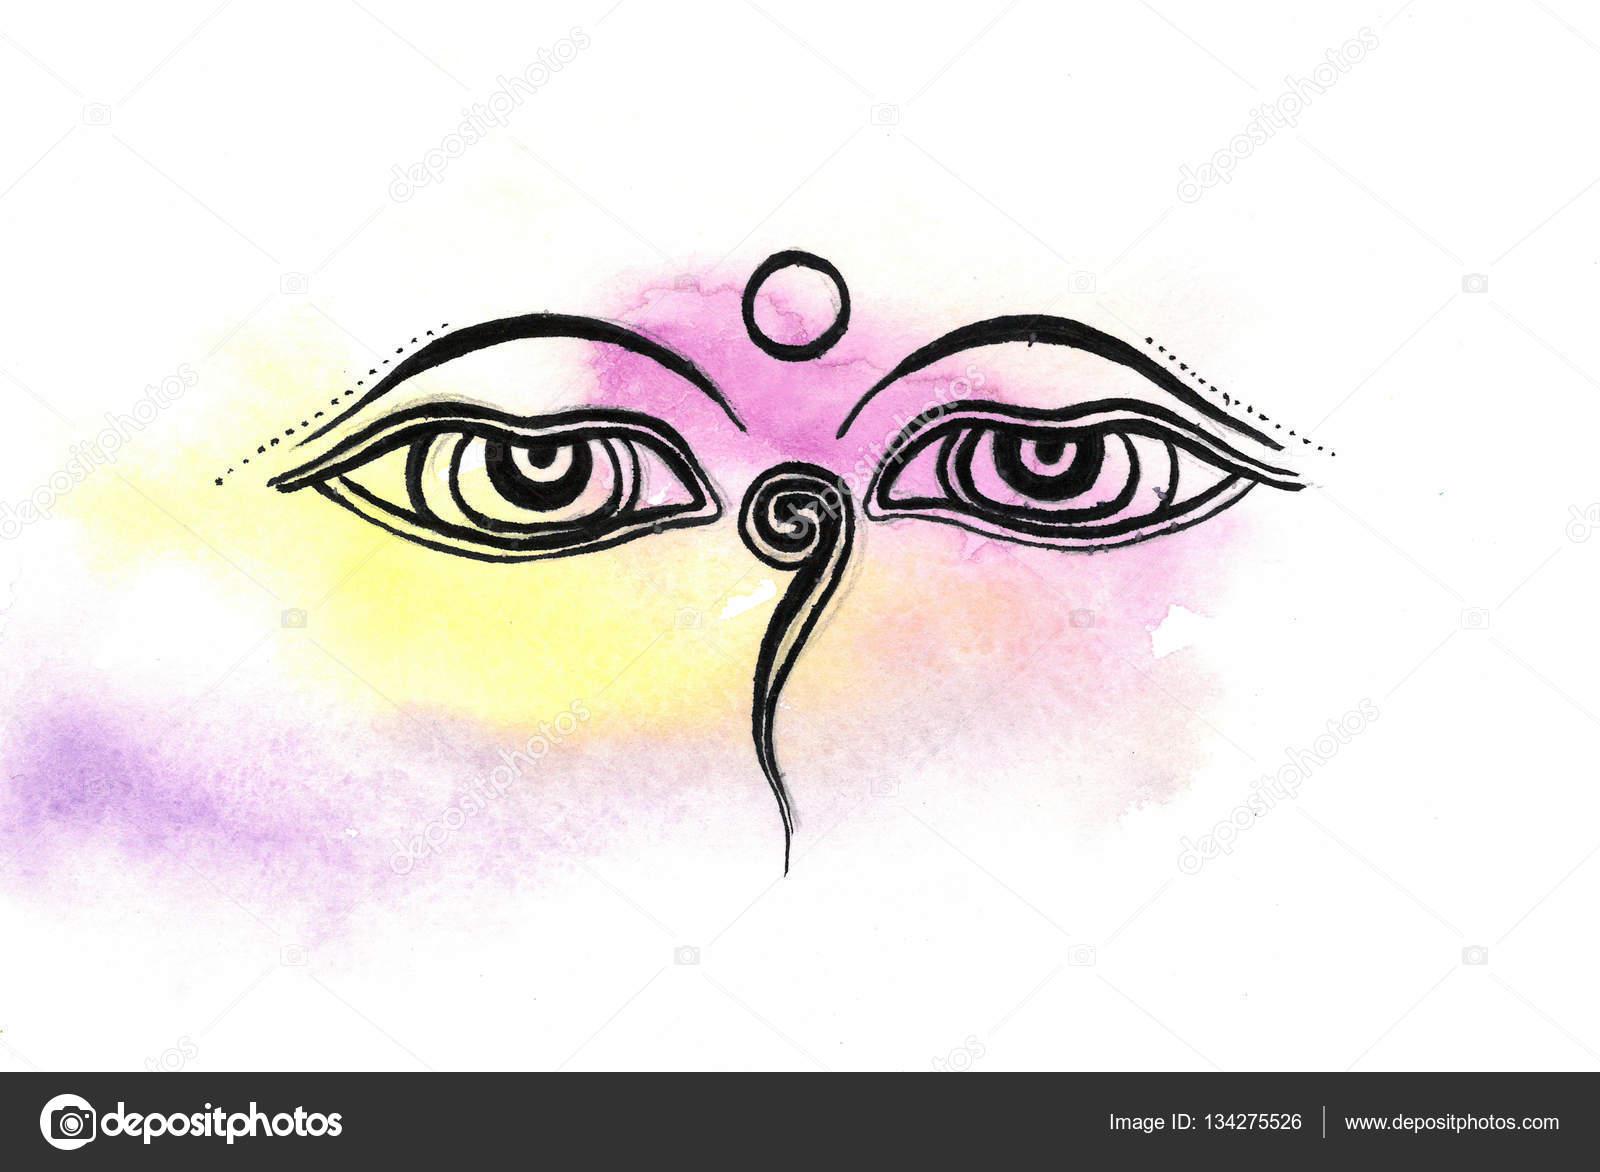 Wisdom eyes of buddha bodhnath temple eyes stock photo wisdom eyes of buddha bodhnath temple eyes stock photo biocorpaavc Images